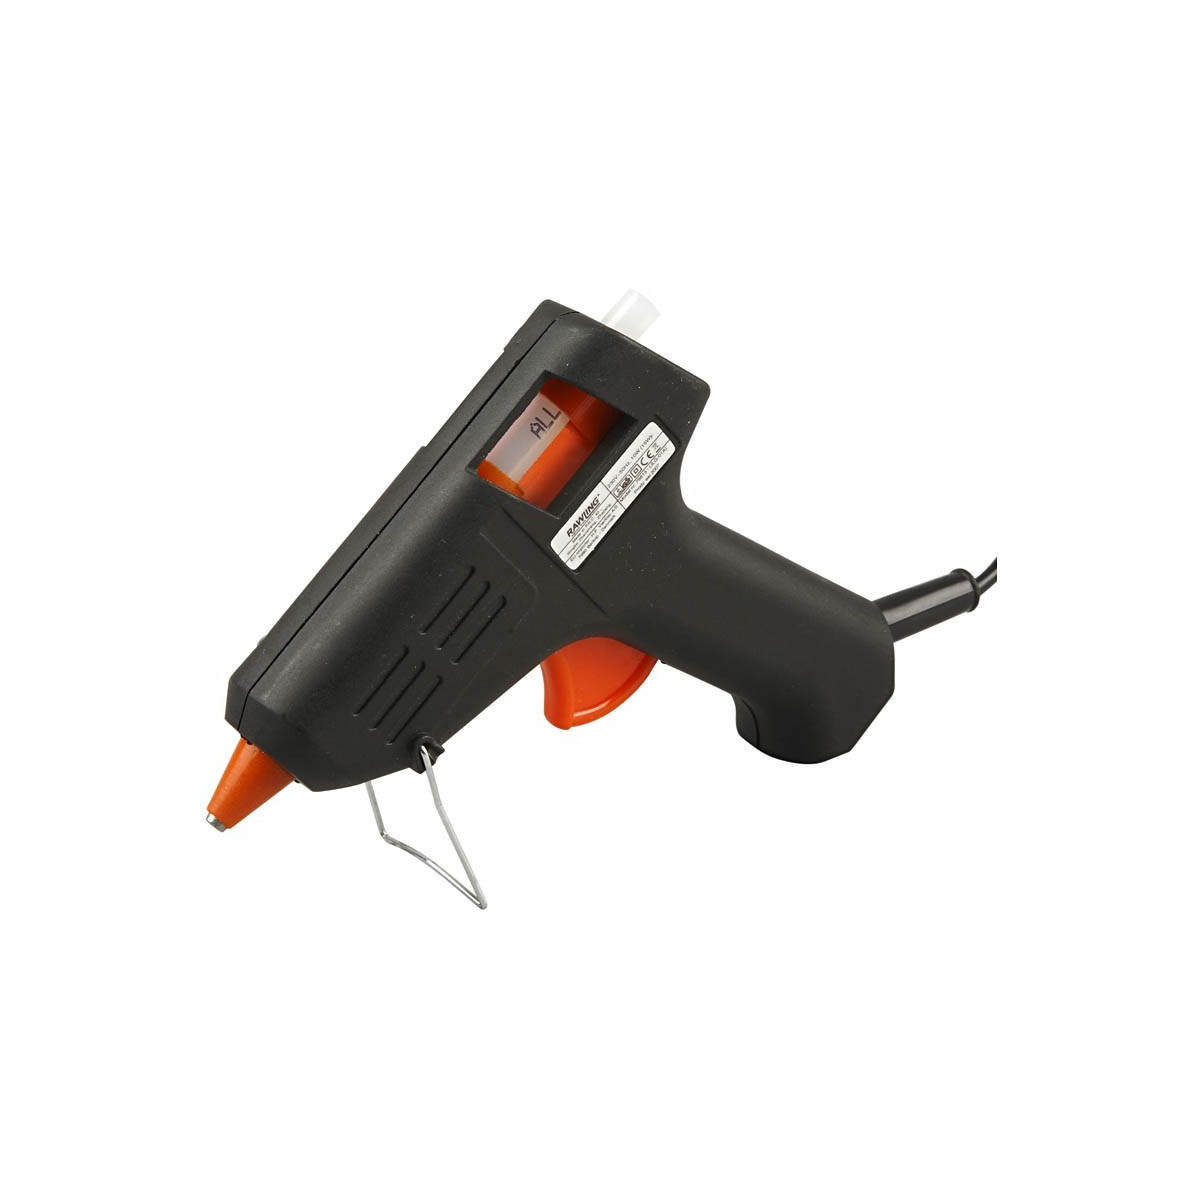 Kanon Limpistol Mini Lav temperatur - Ritohobby.no XH-87